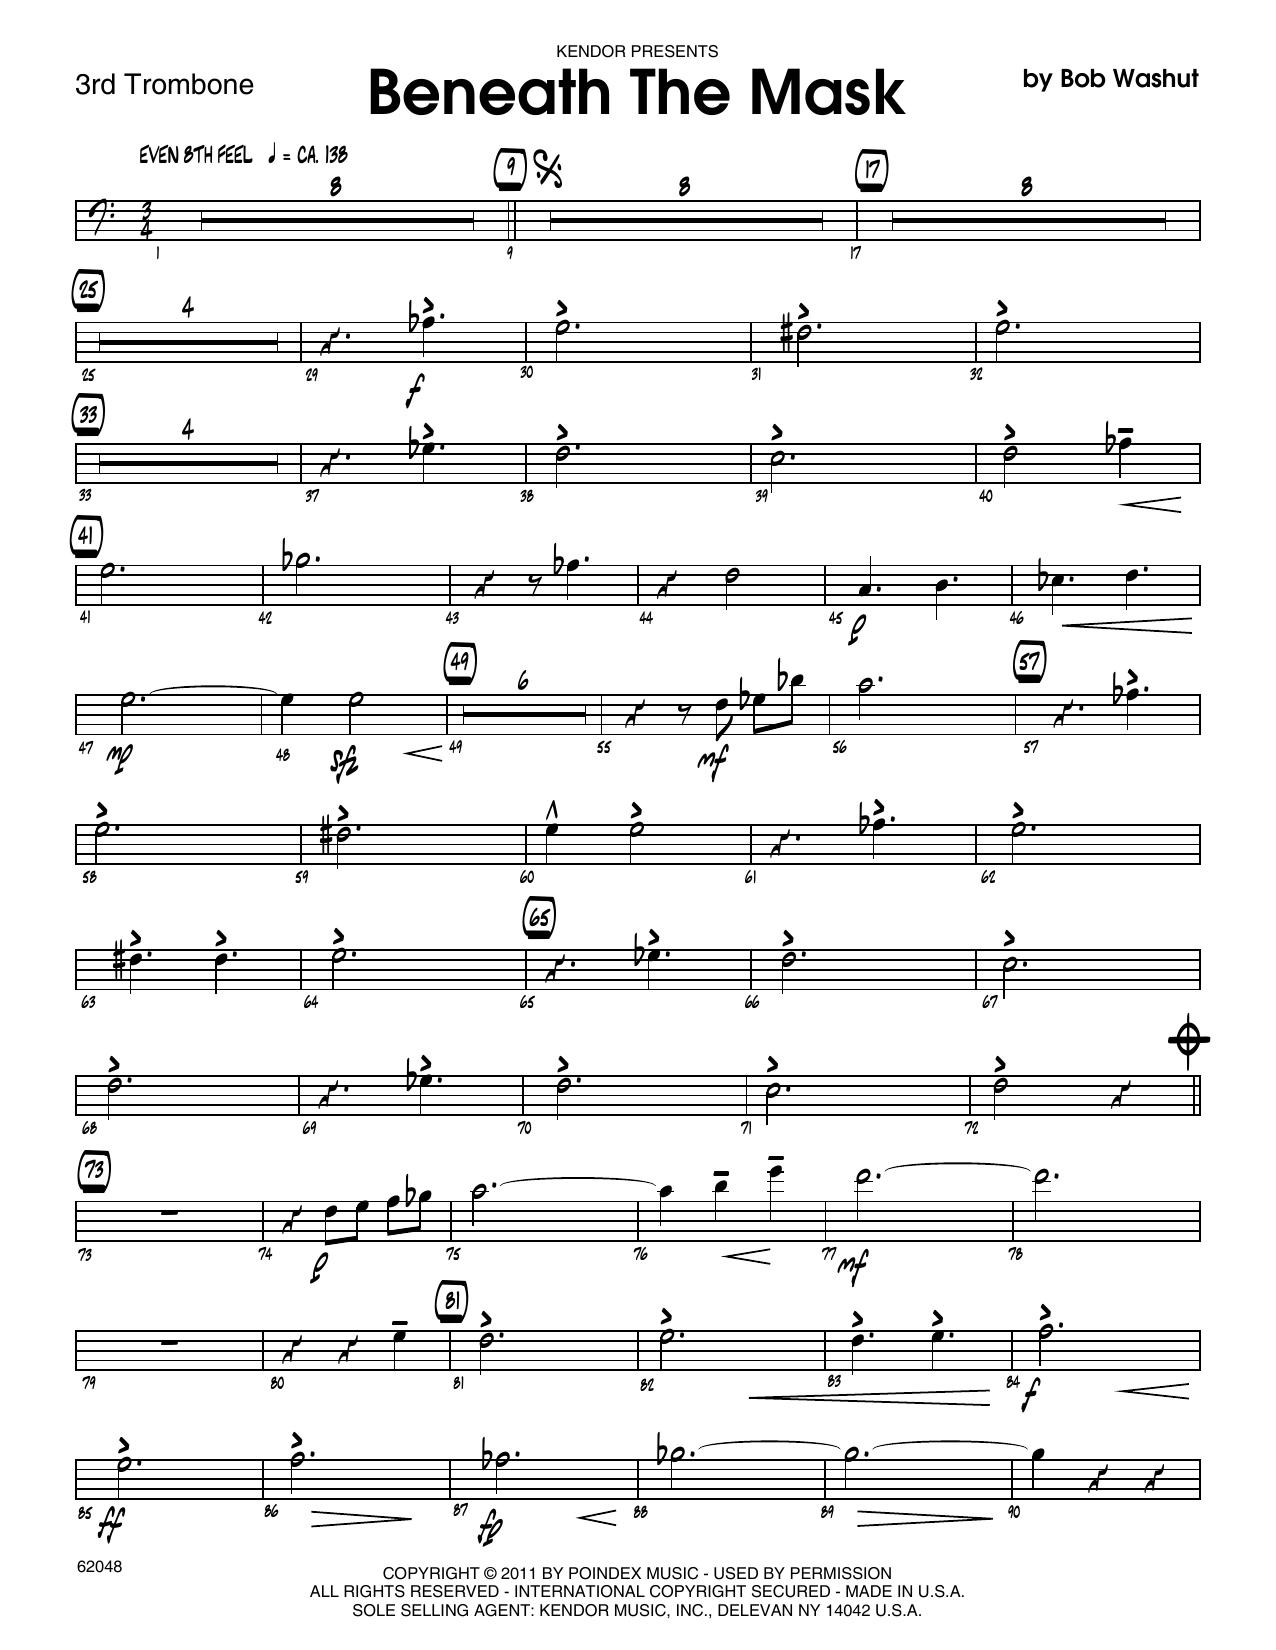 Beneath The Mask - 3rd Trombone